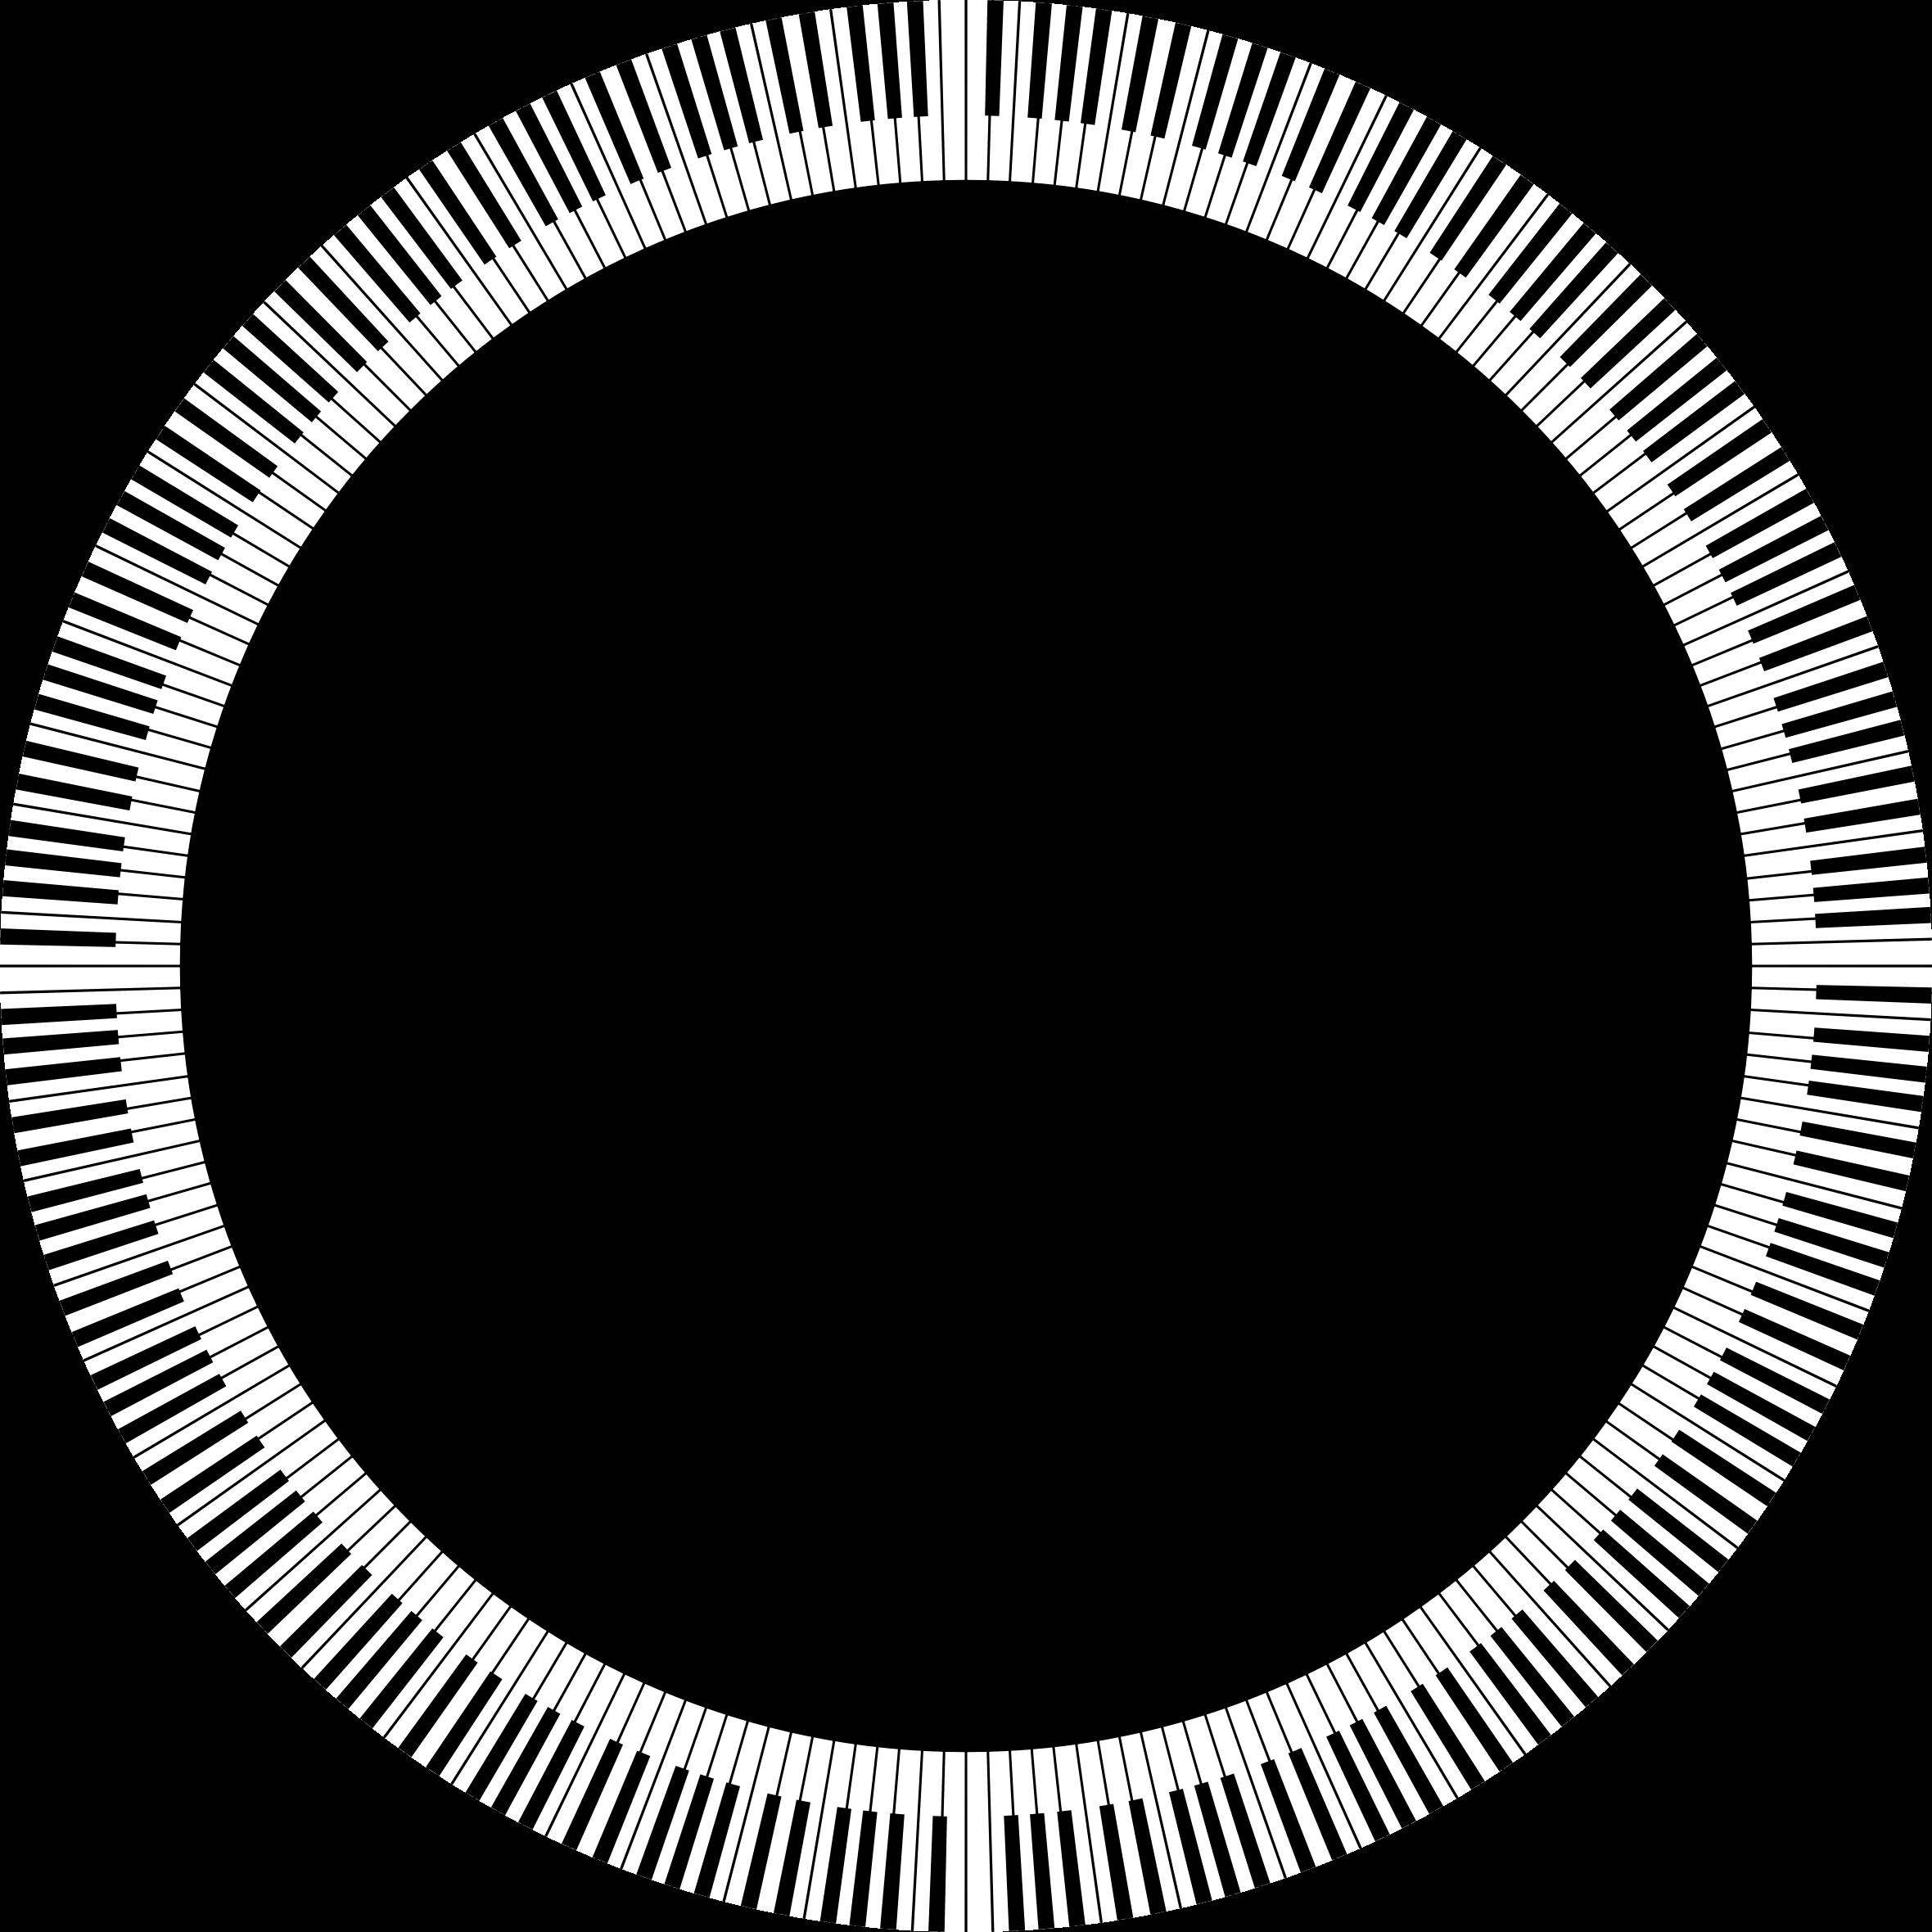 Piano keys circle medium. Oval clipart ellipse